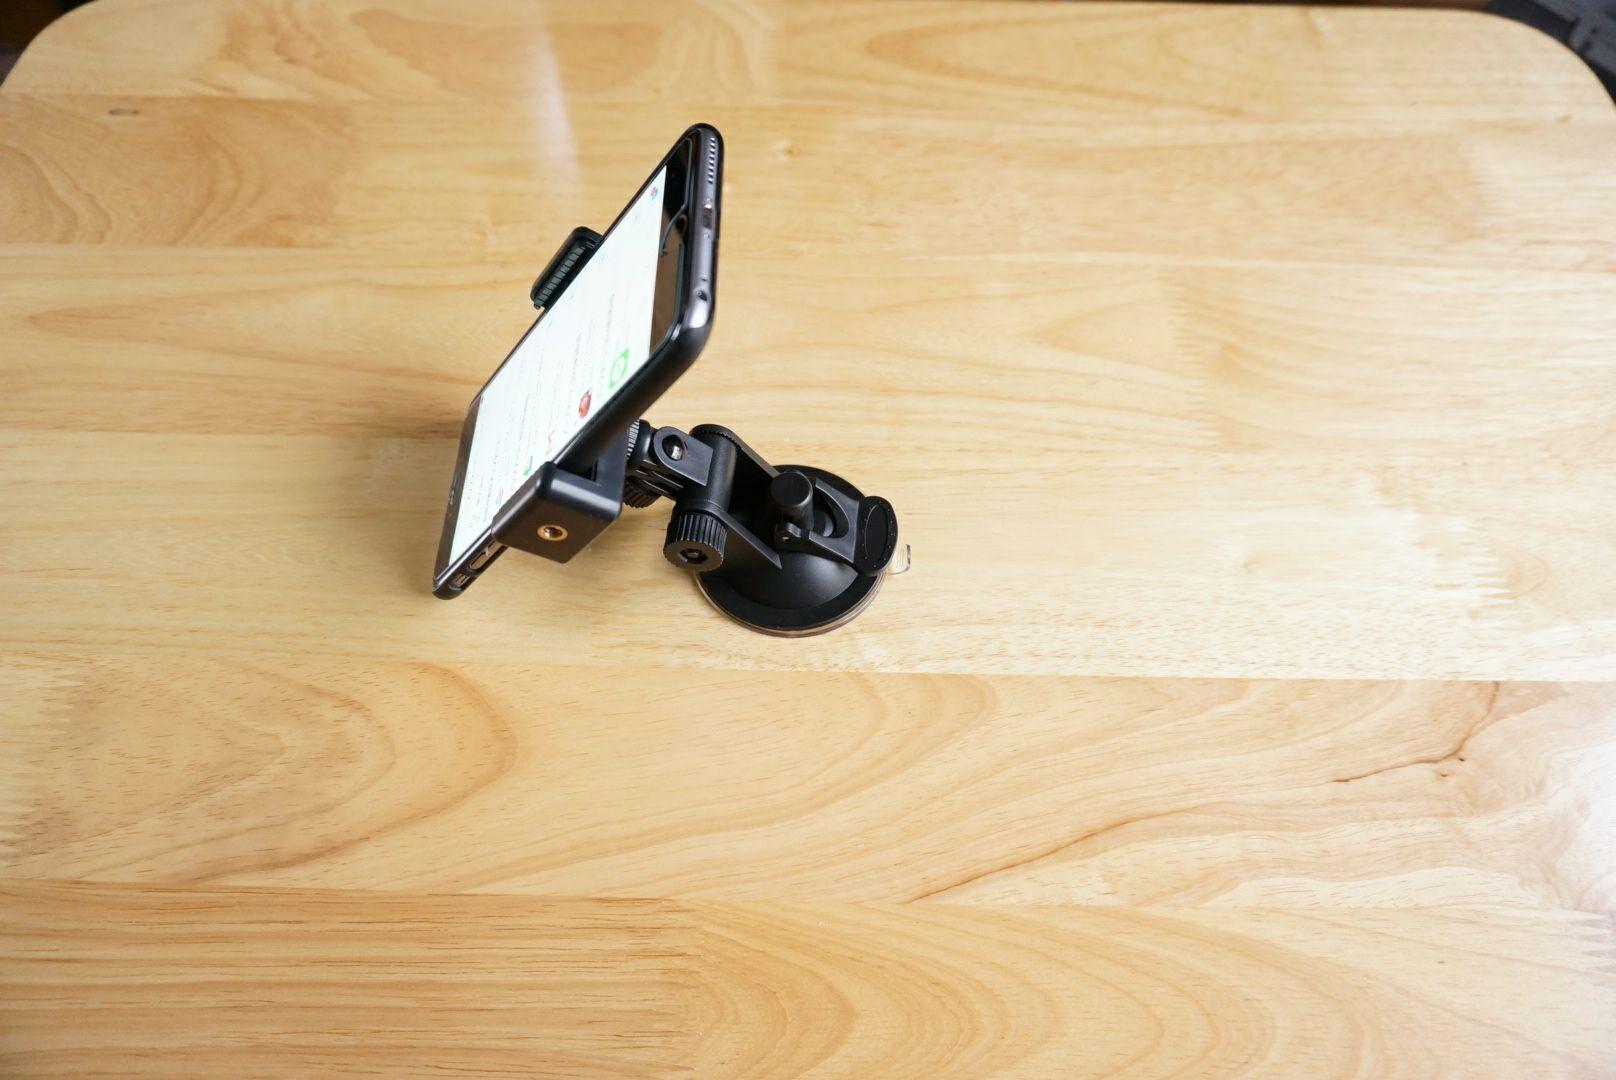 Eco Ride World 車載カメラホルダー スタンド吸盤式マウント CS_009 2WAY Mount iPhone6 Plus